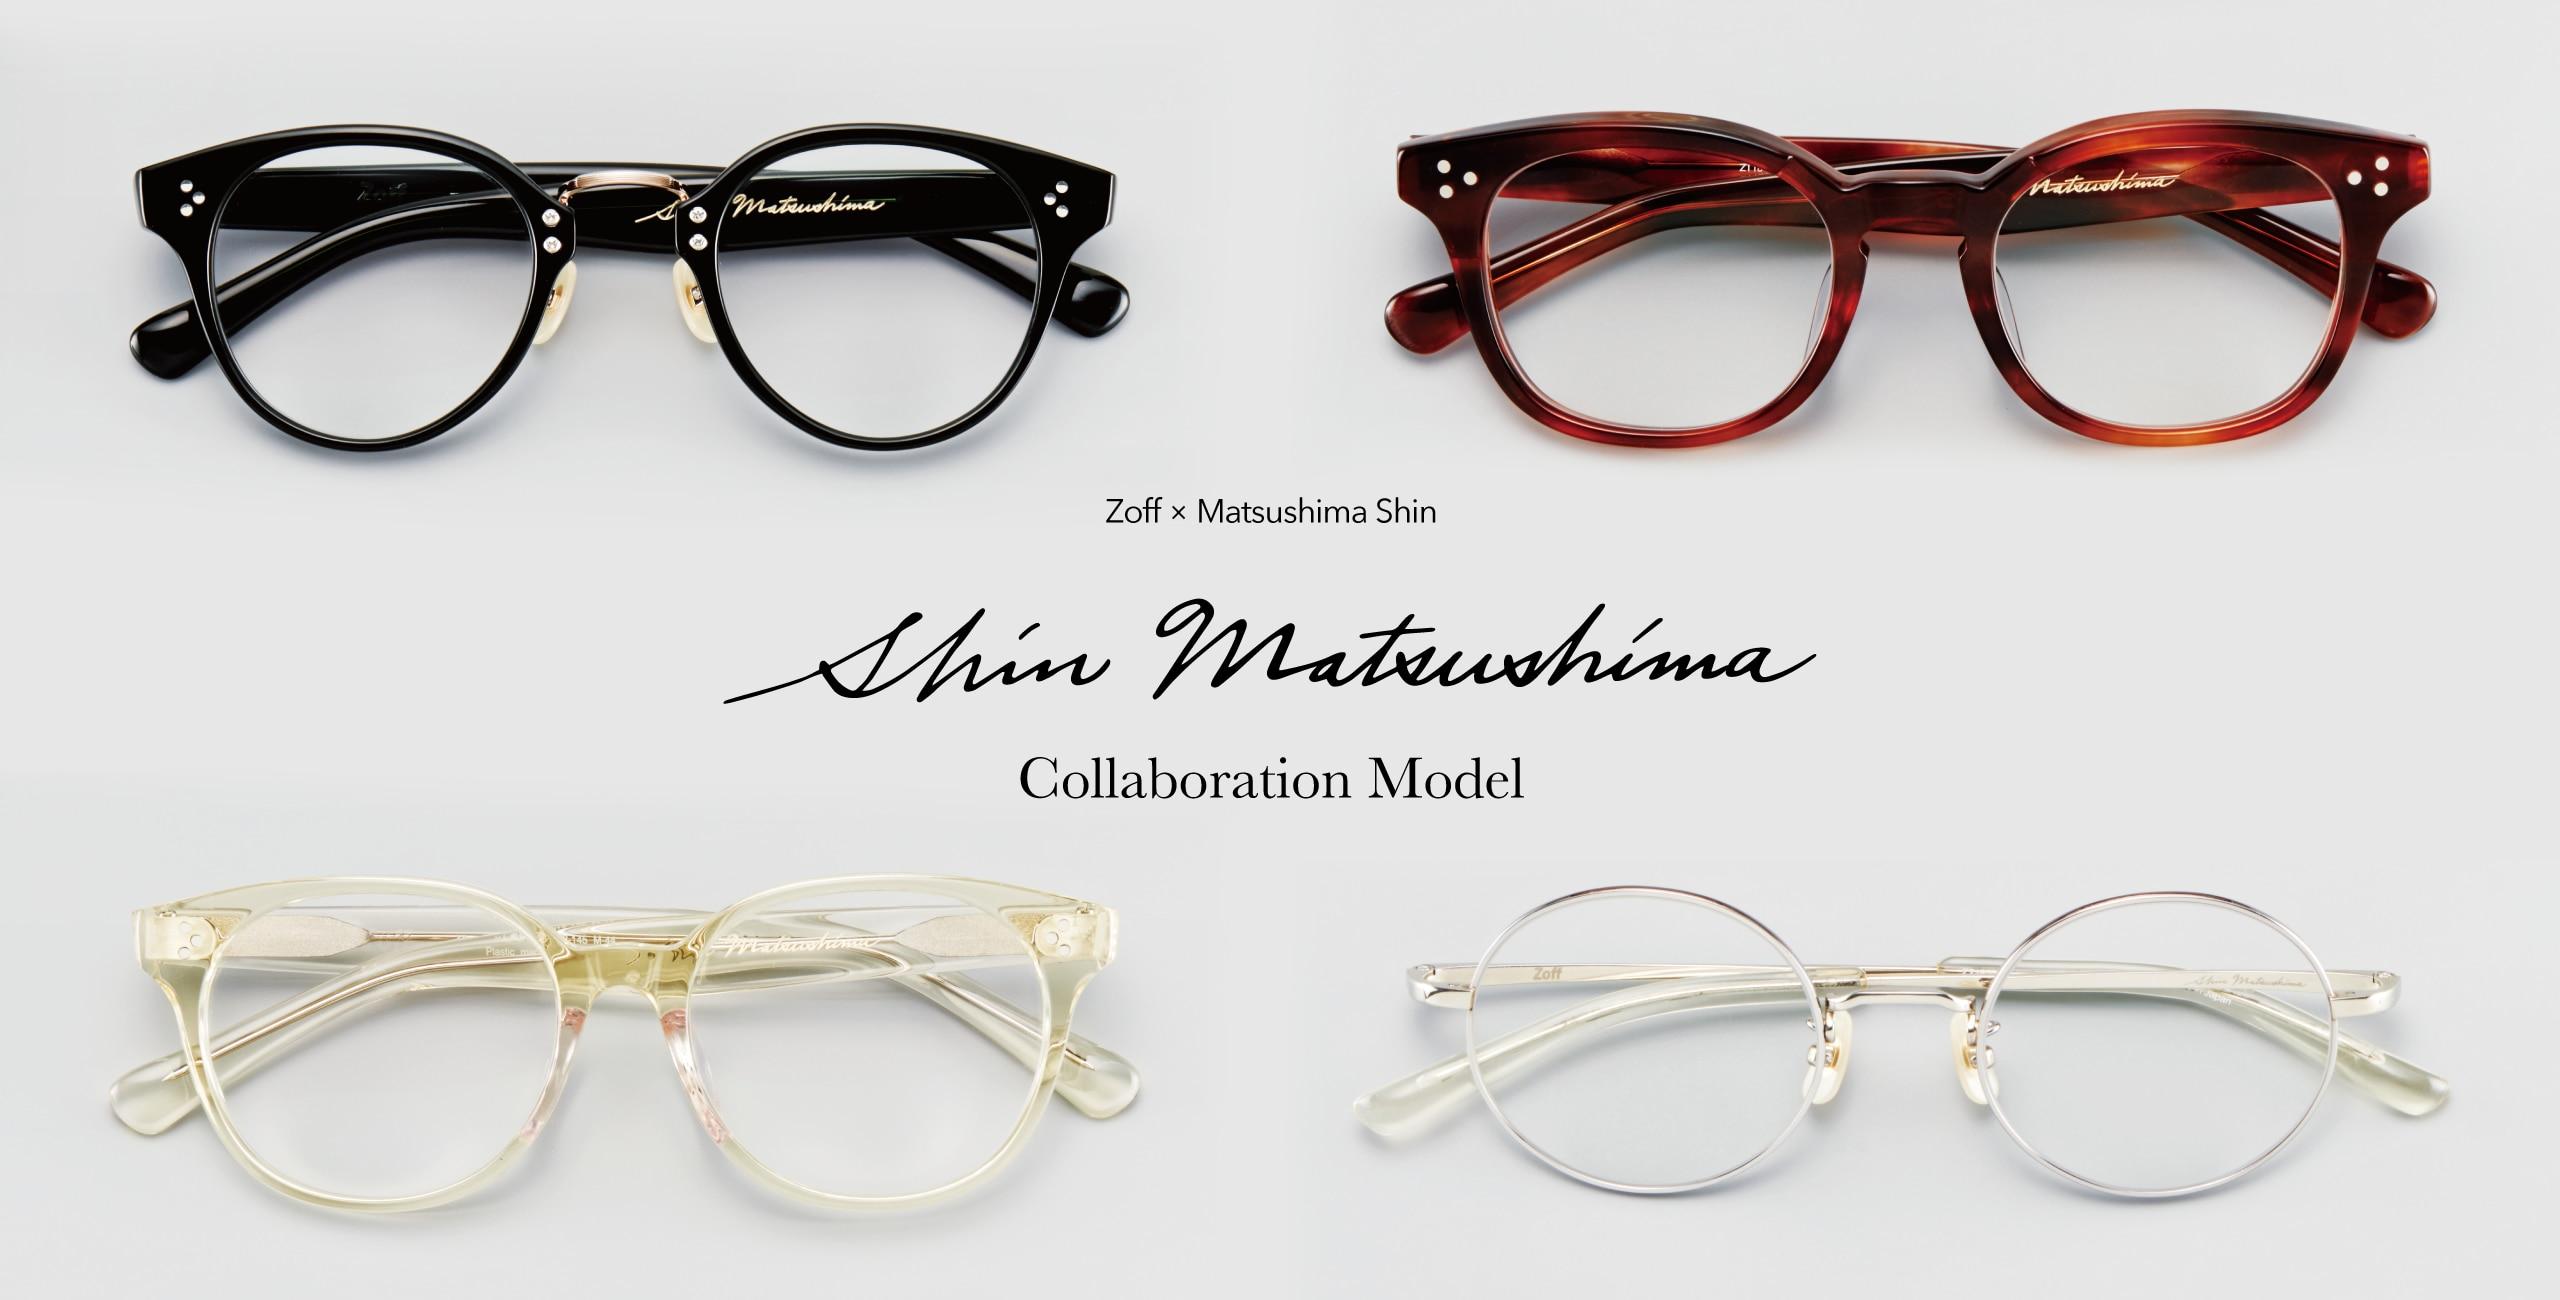 Zoff × Matsushima Shin